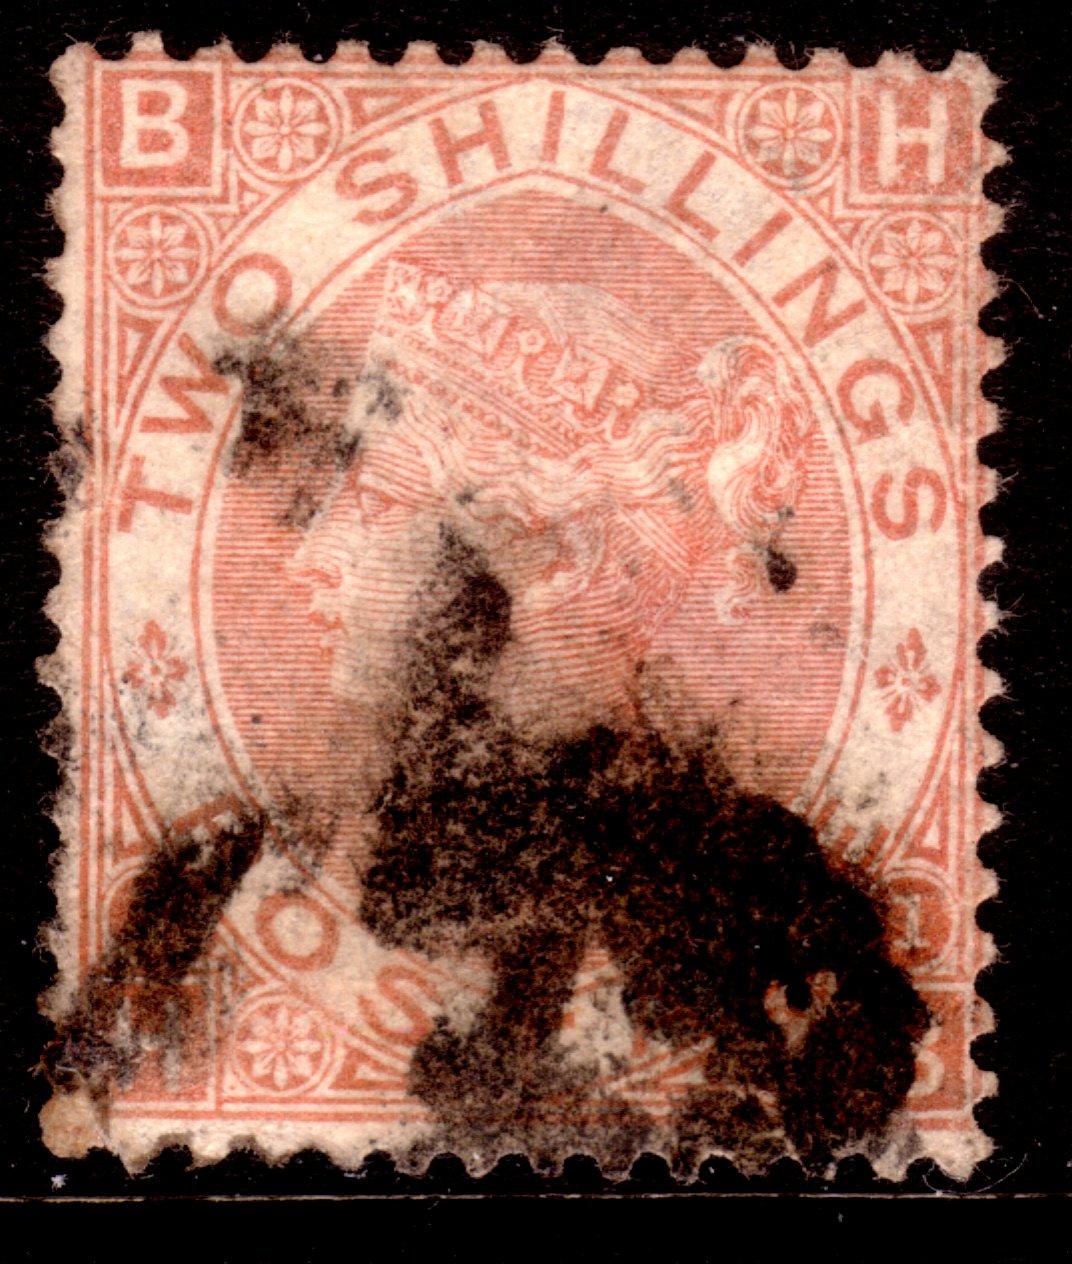 1880 2 Shilling Brown Excellent Colour - SOLD